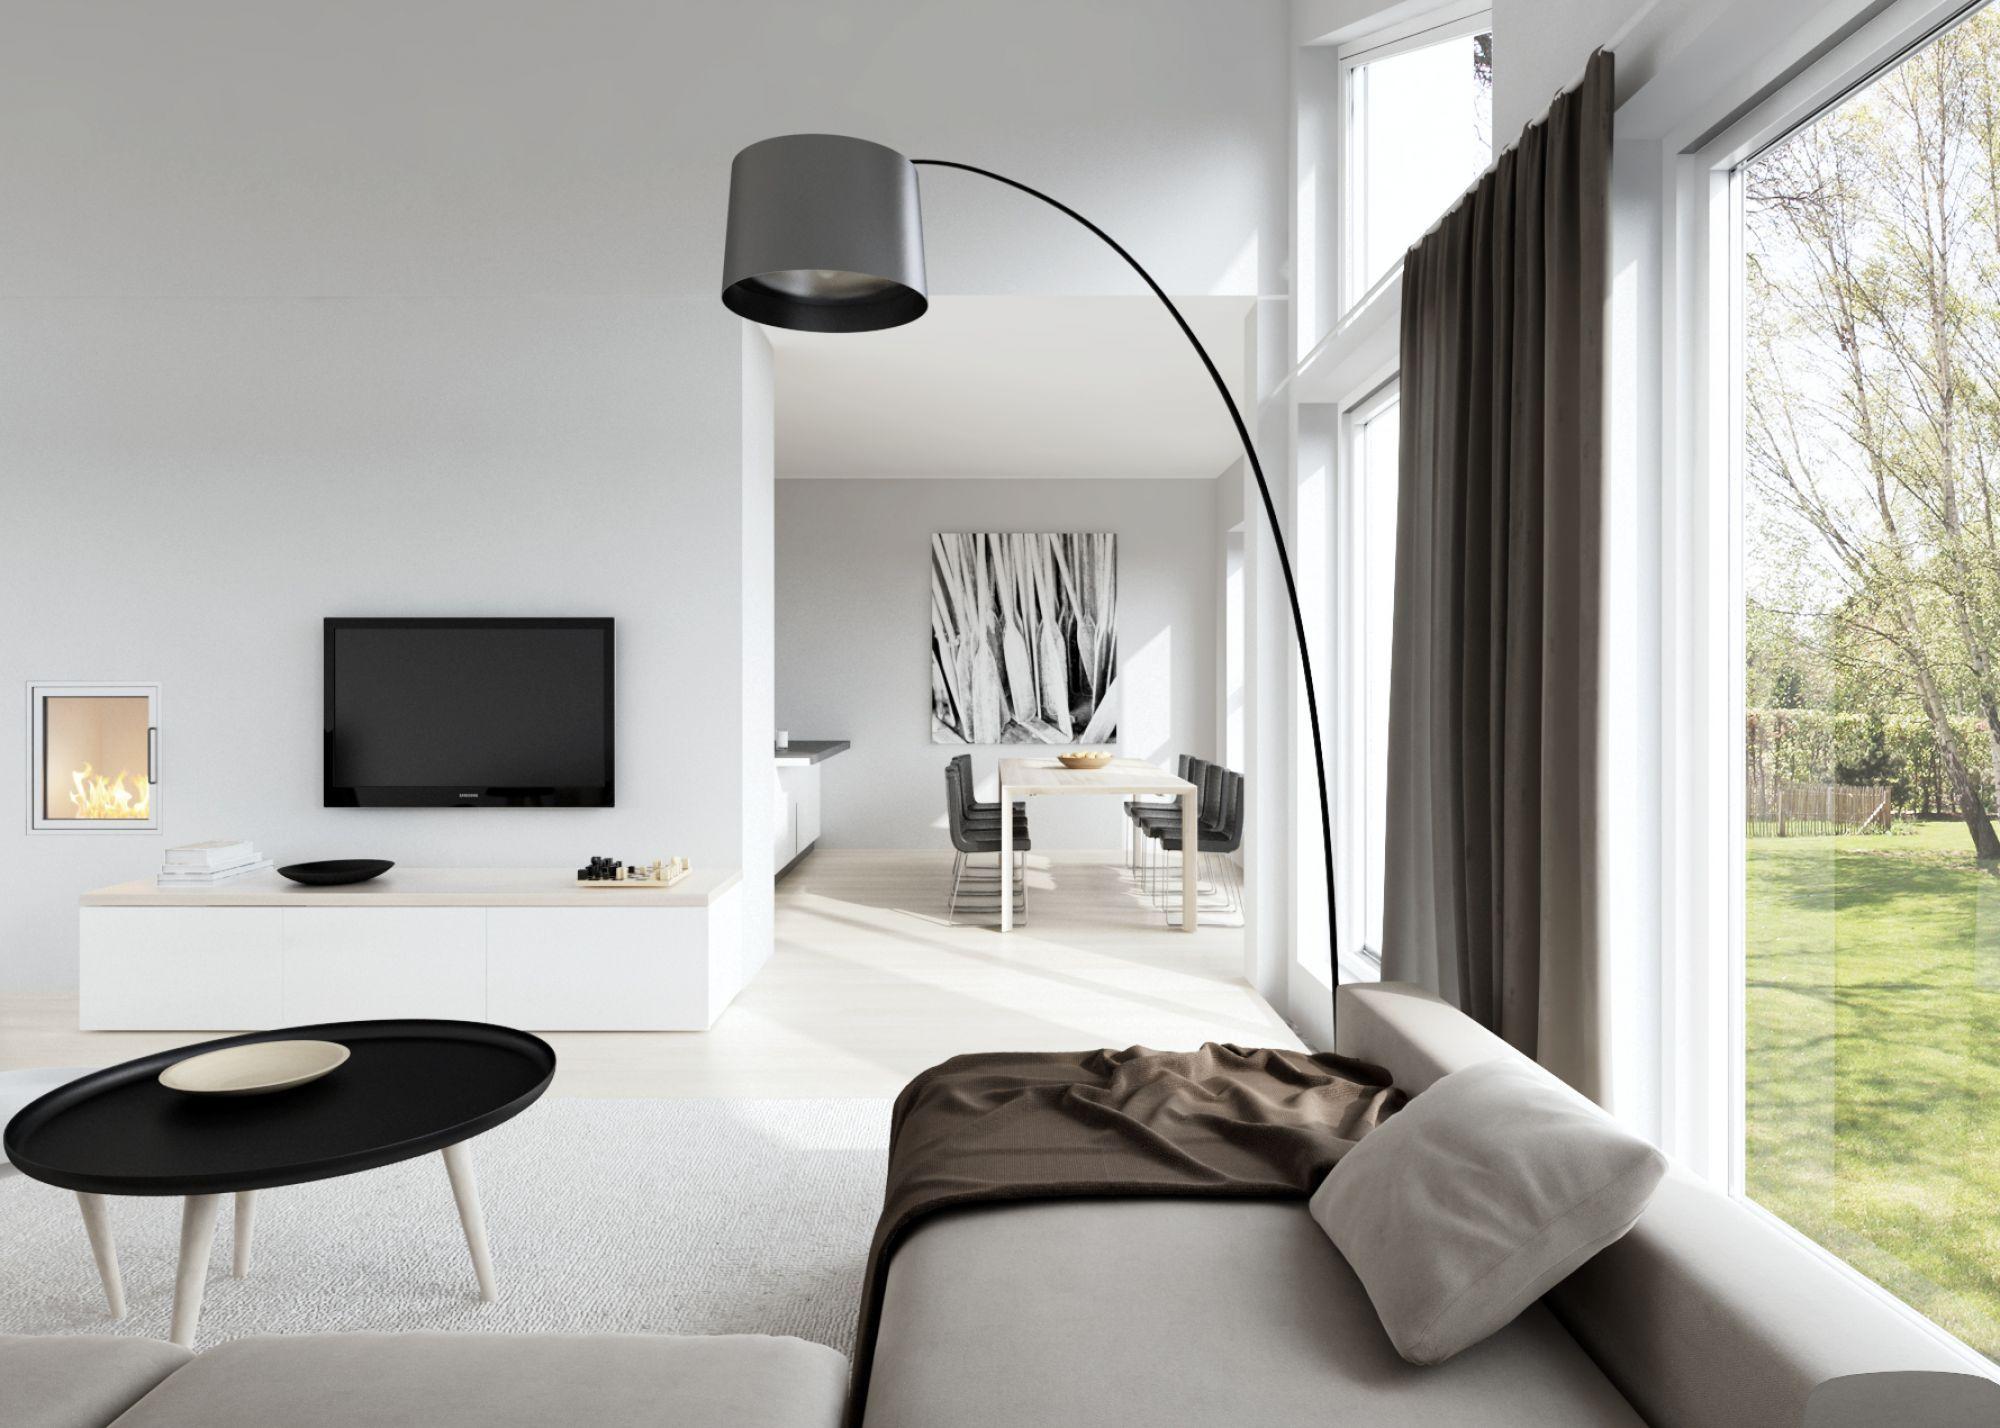 nordic interior design - Hledat Googlem